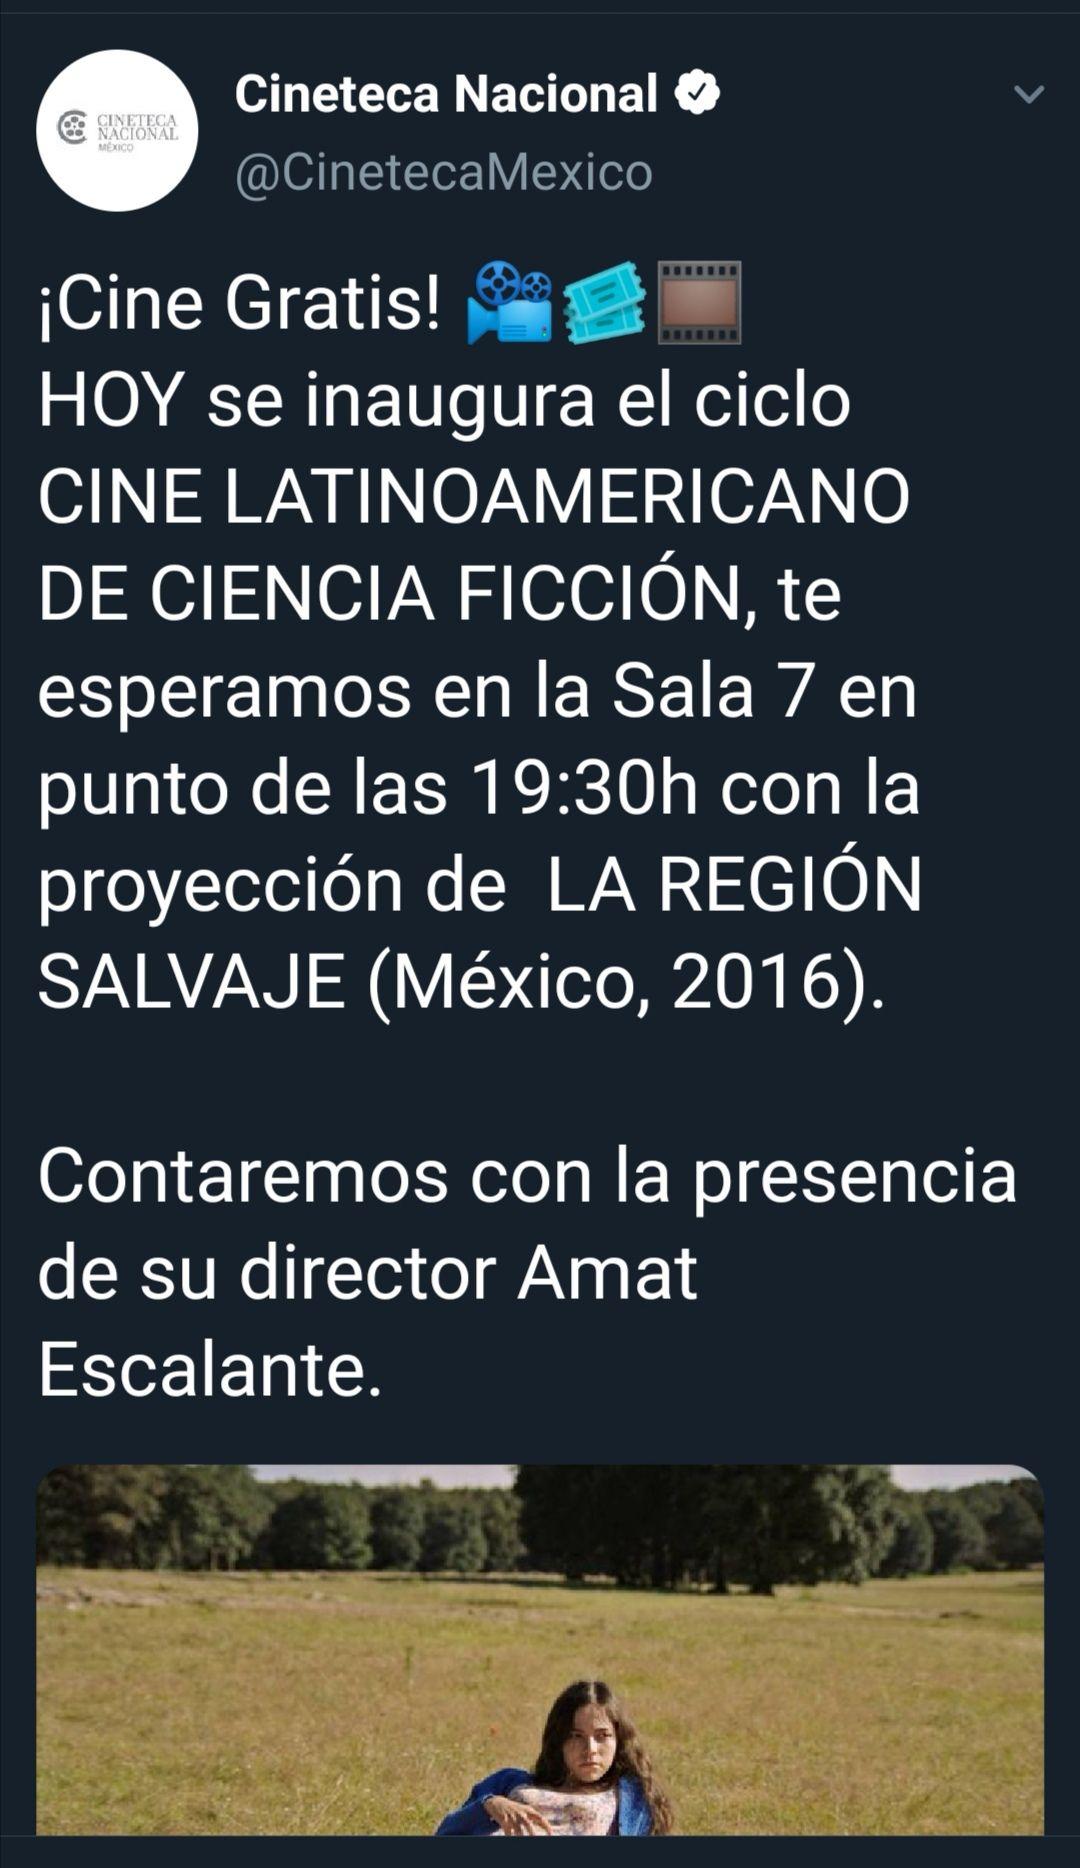 Cineteca Nacional Cine gratis